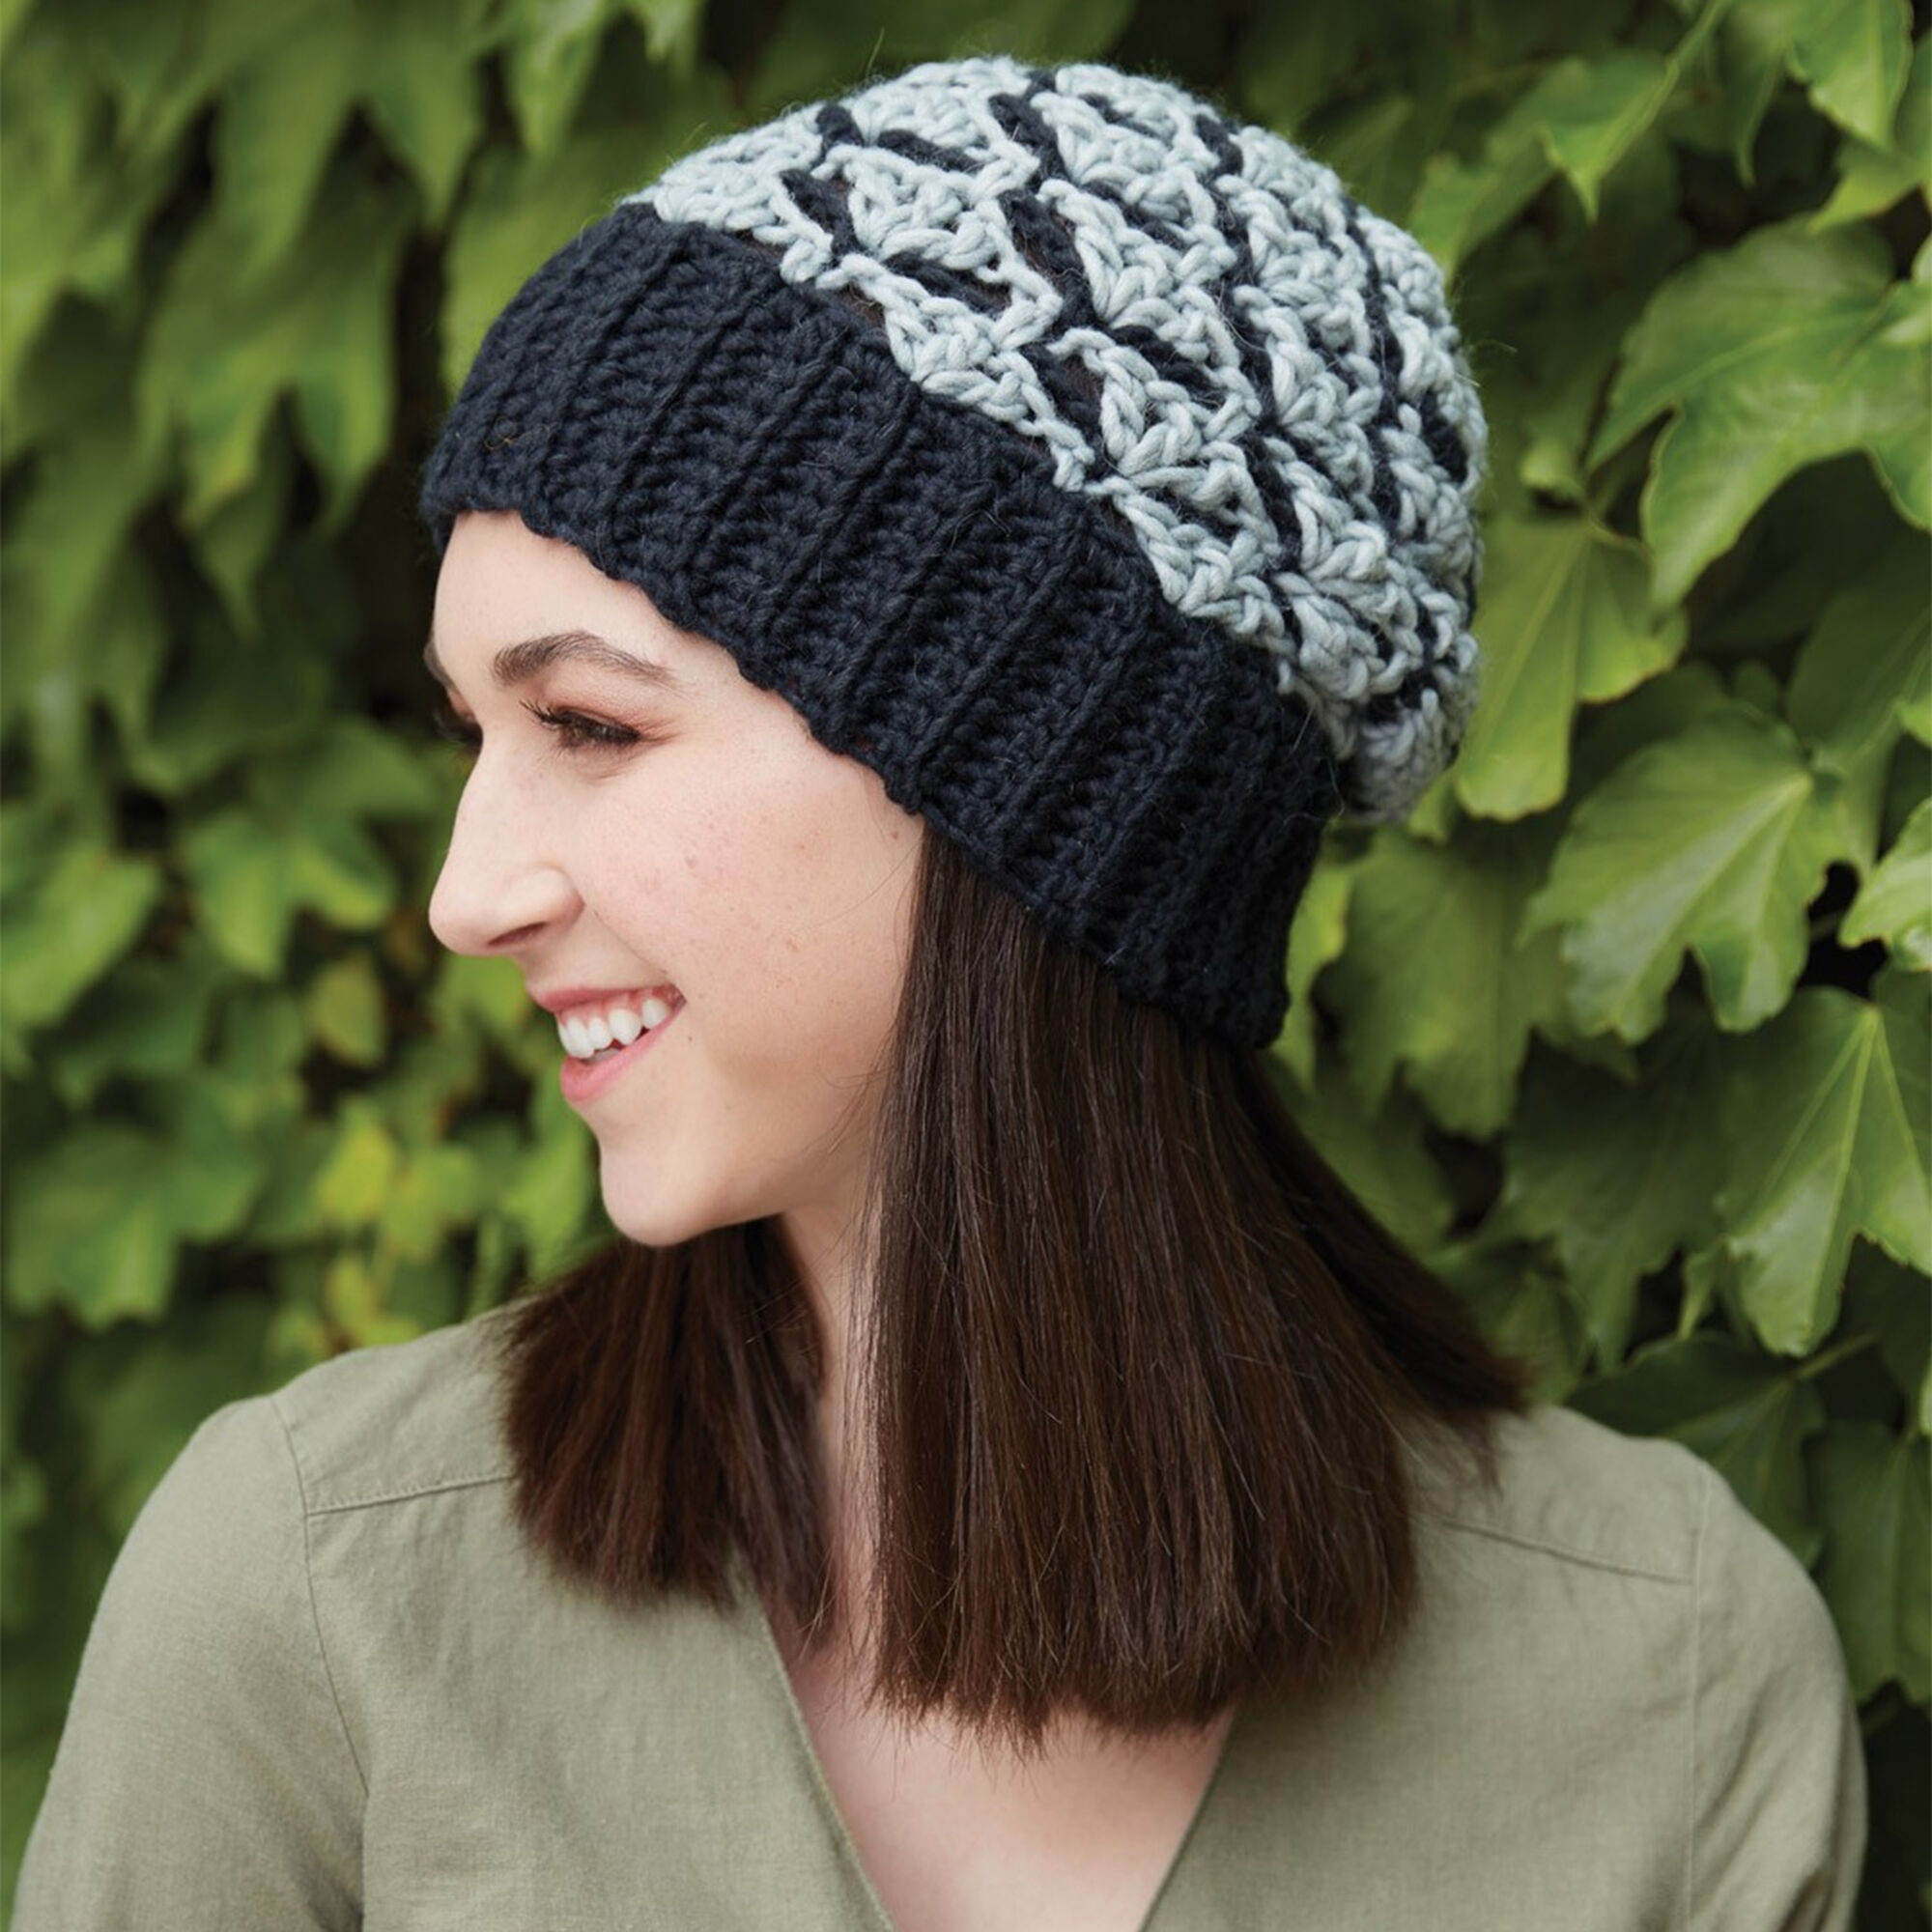 Patons Crochet Shadow Shells Hat Yarnspirations